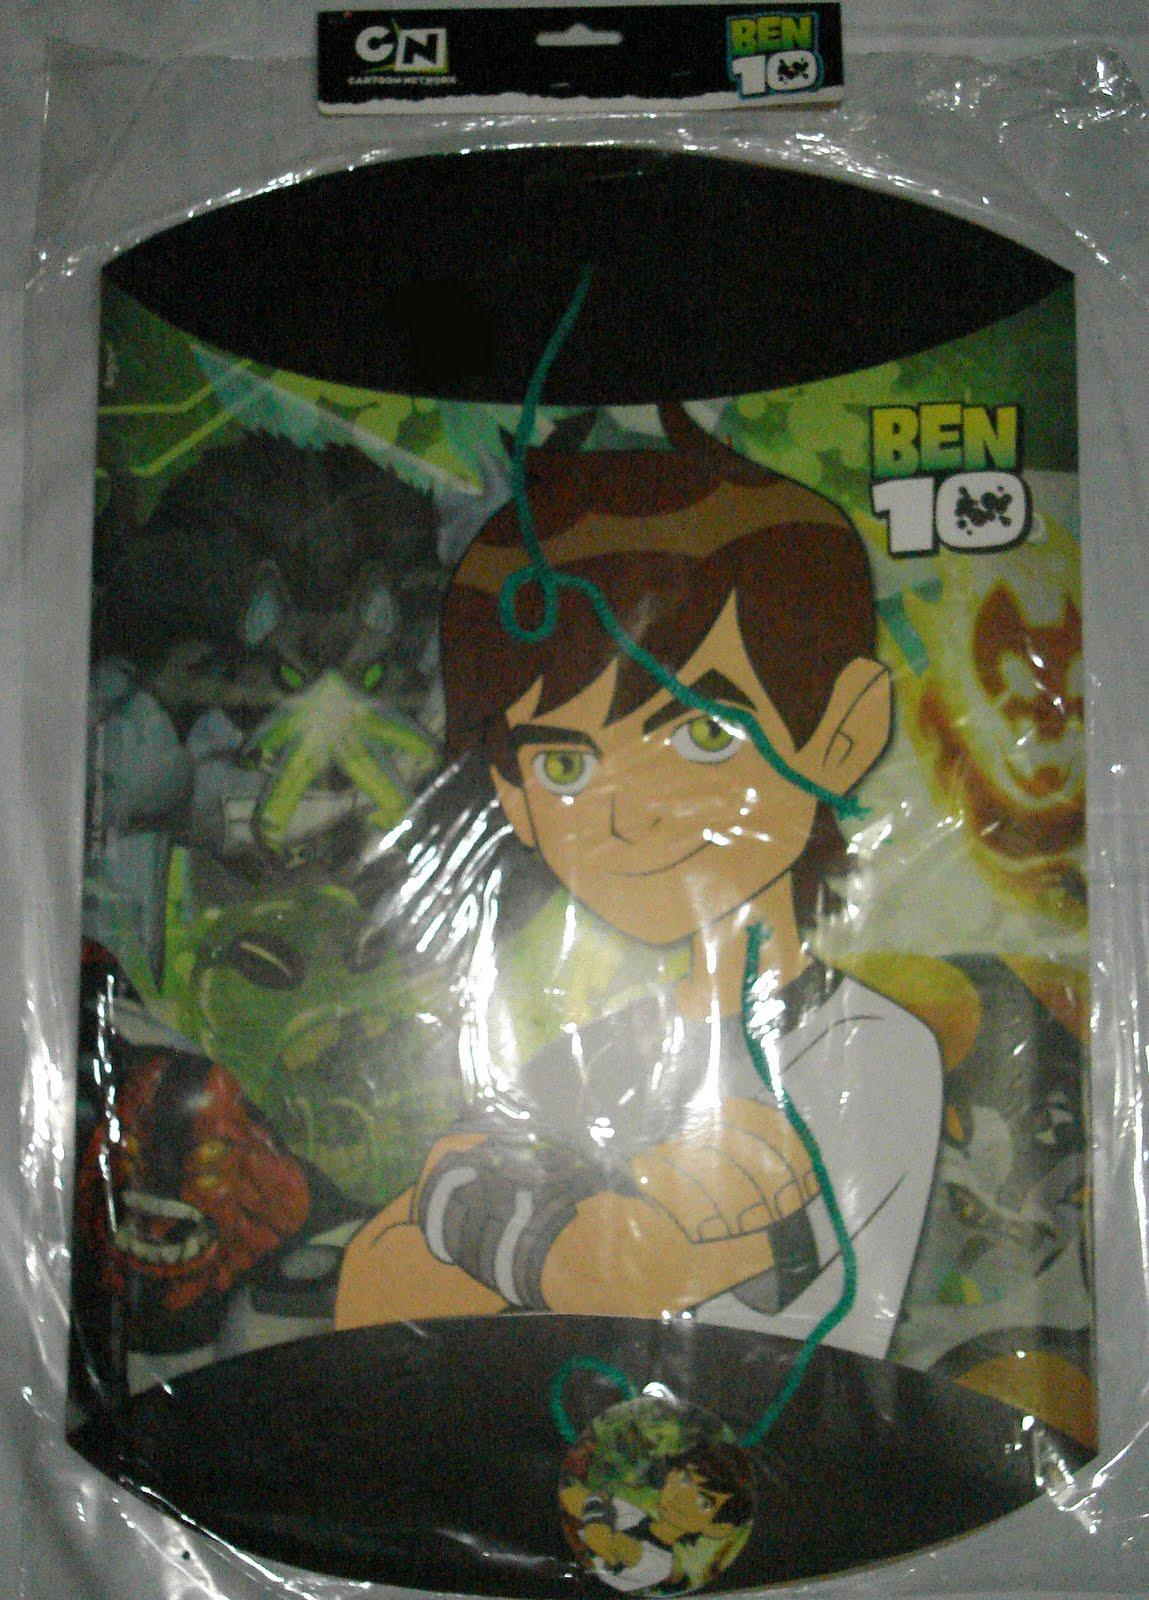 piñata de ben 10 en carton corrugado